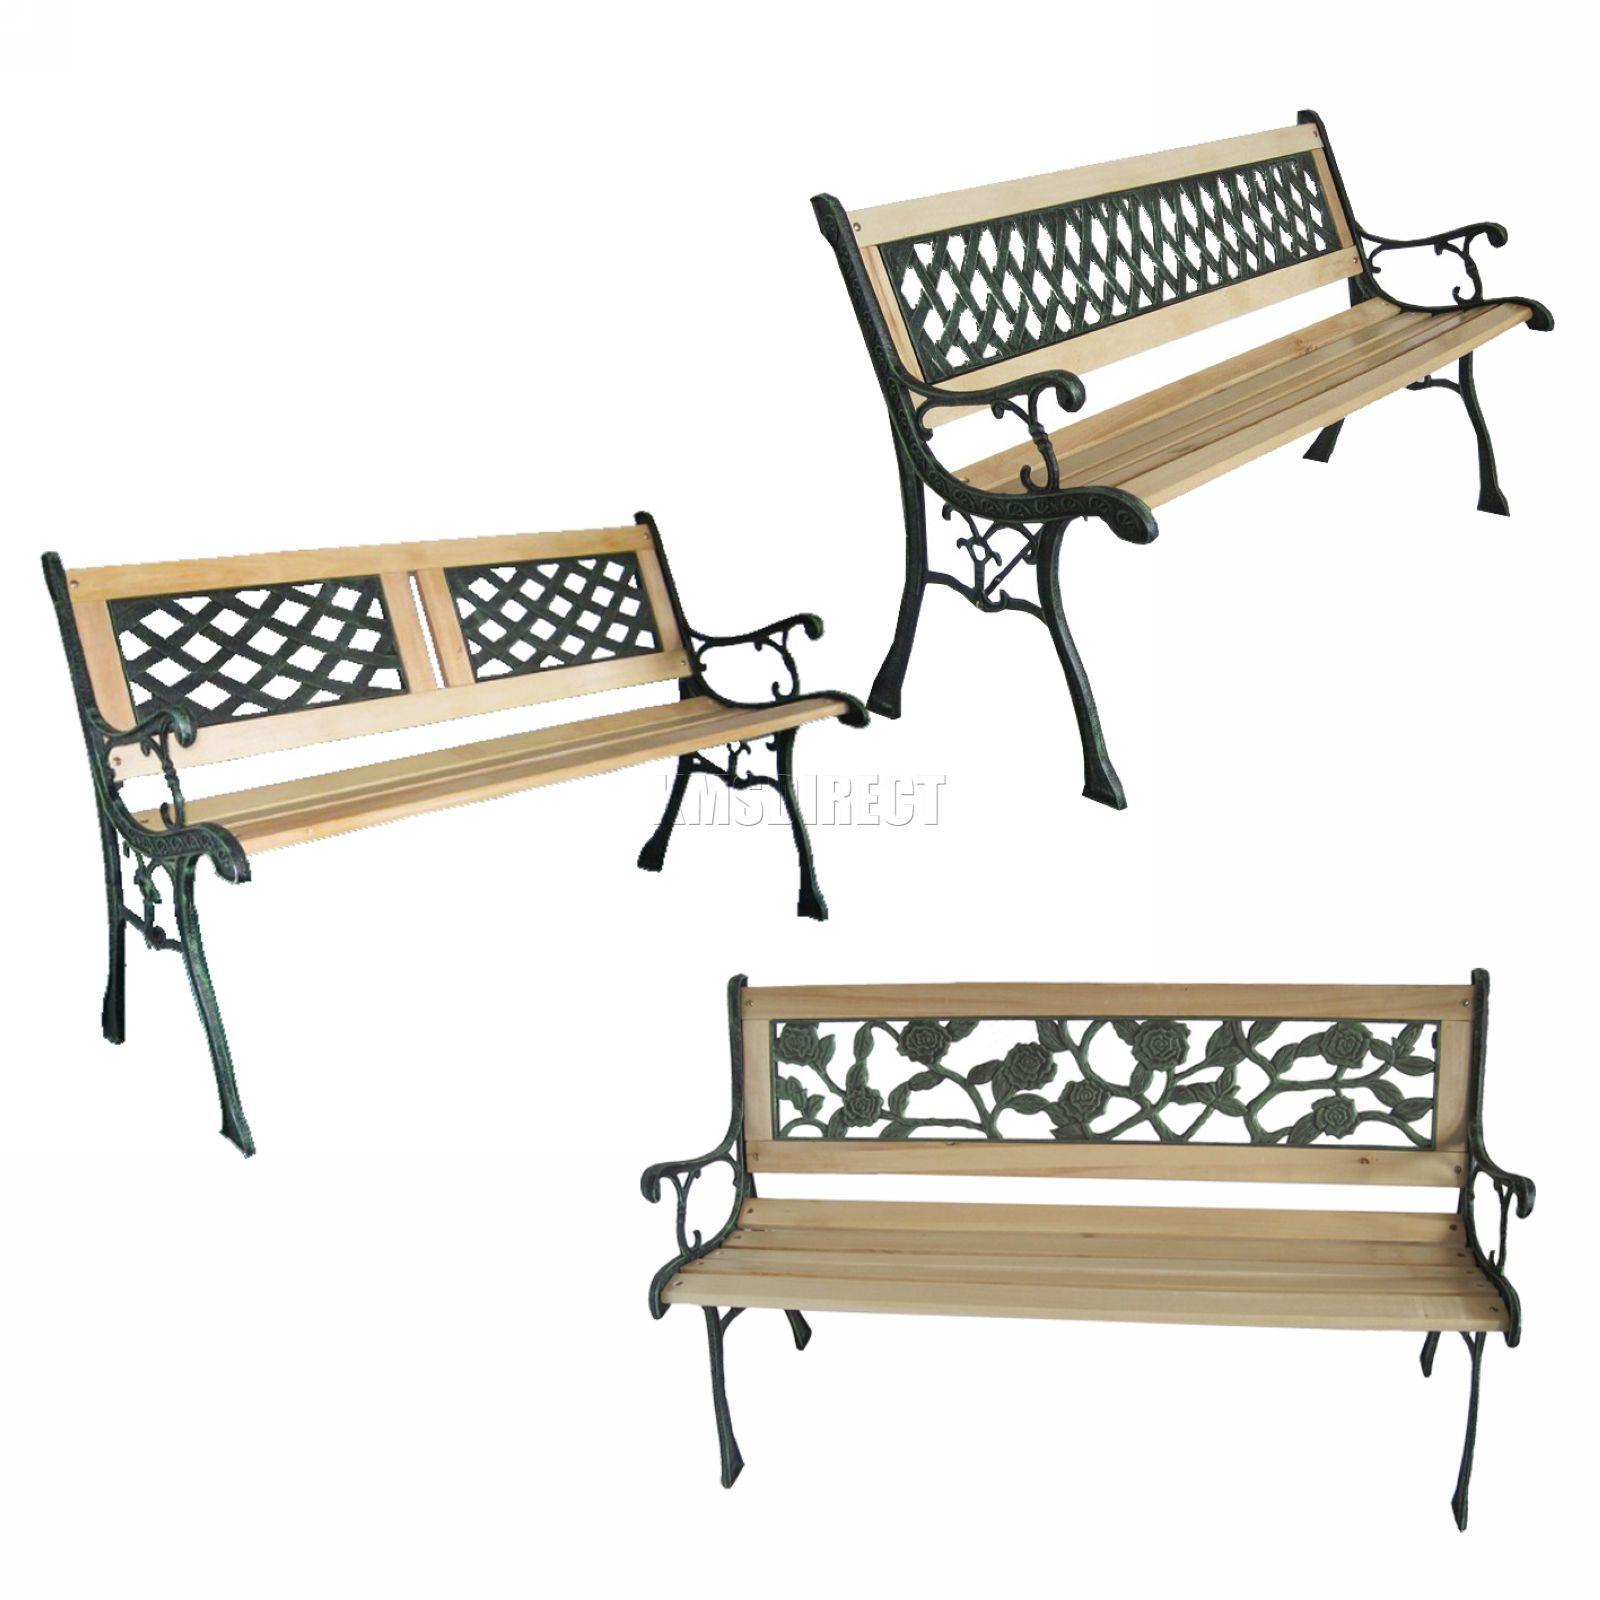 WestWood 3 Seater Outdoor Wooden Garden Bench Cast Iron